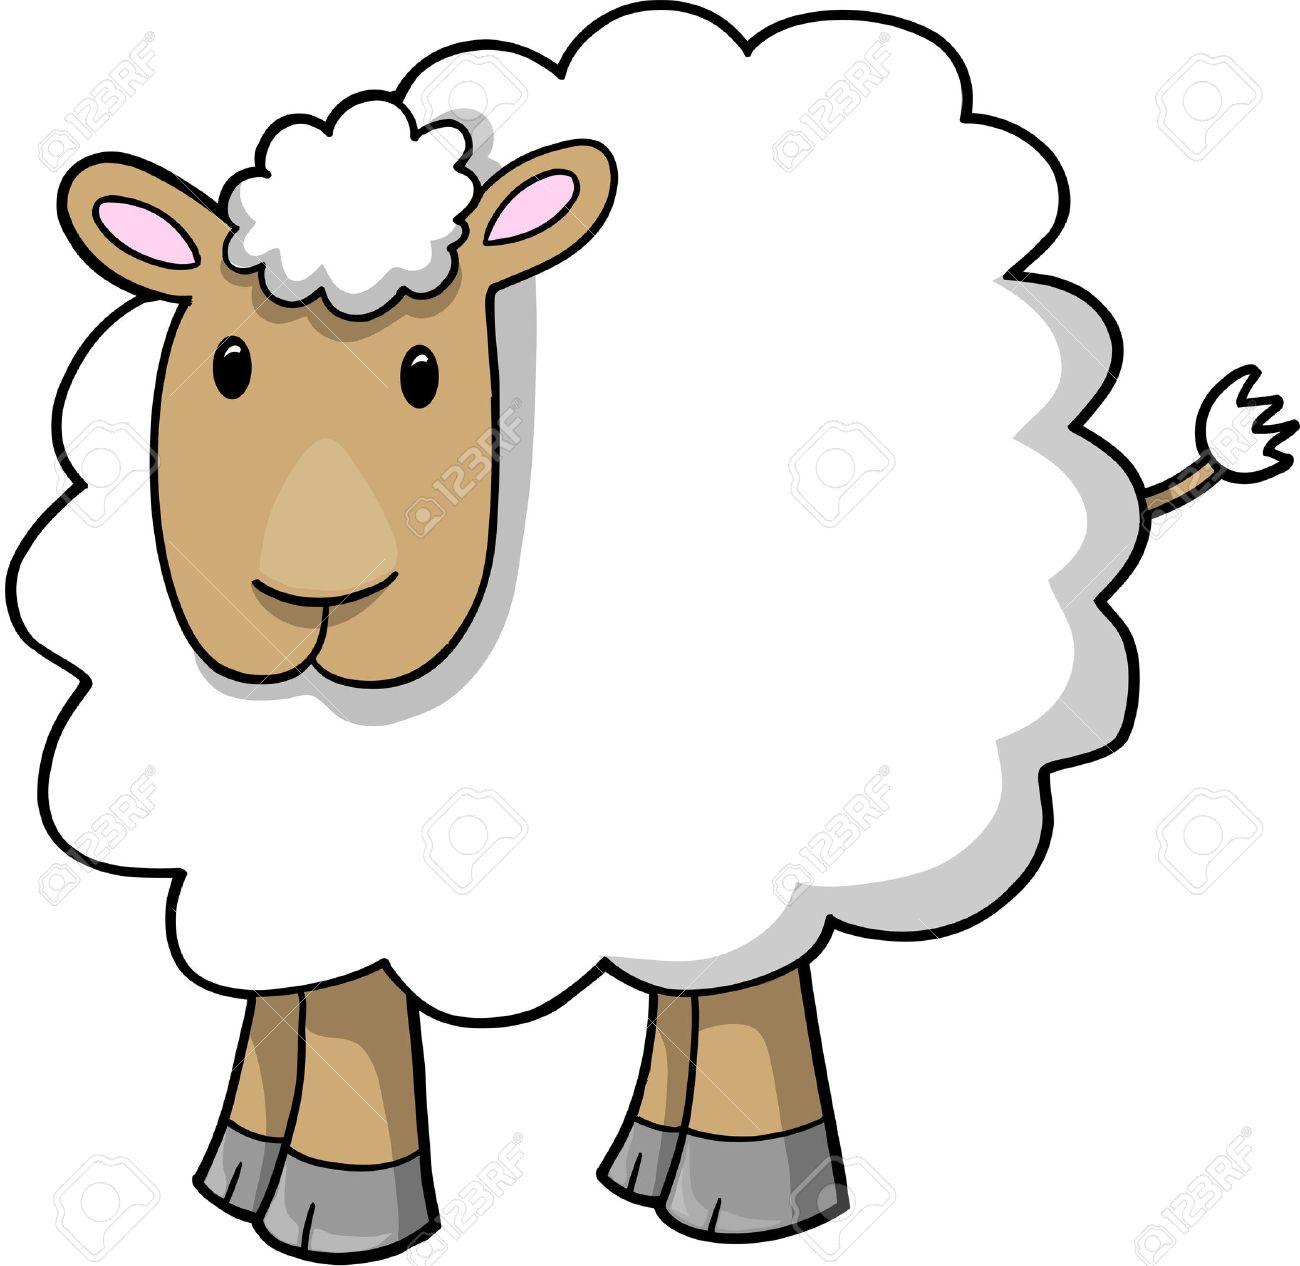 Sheep Lamb Stock Vector - 6774849